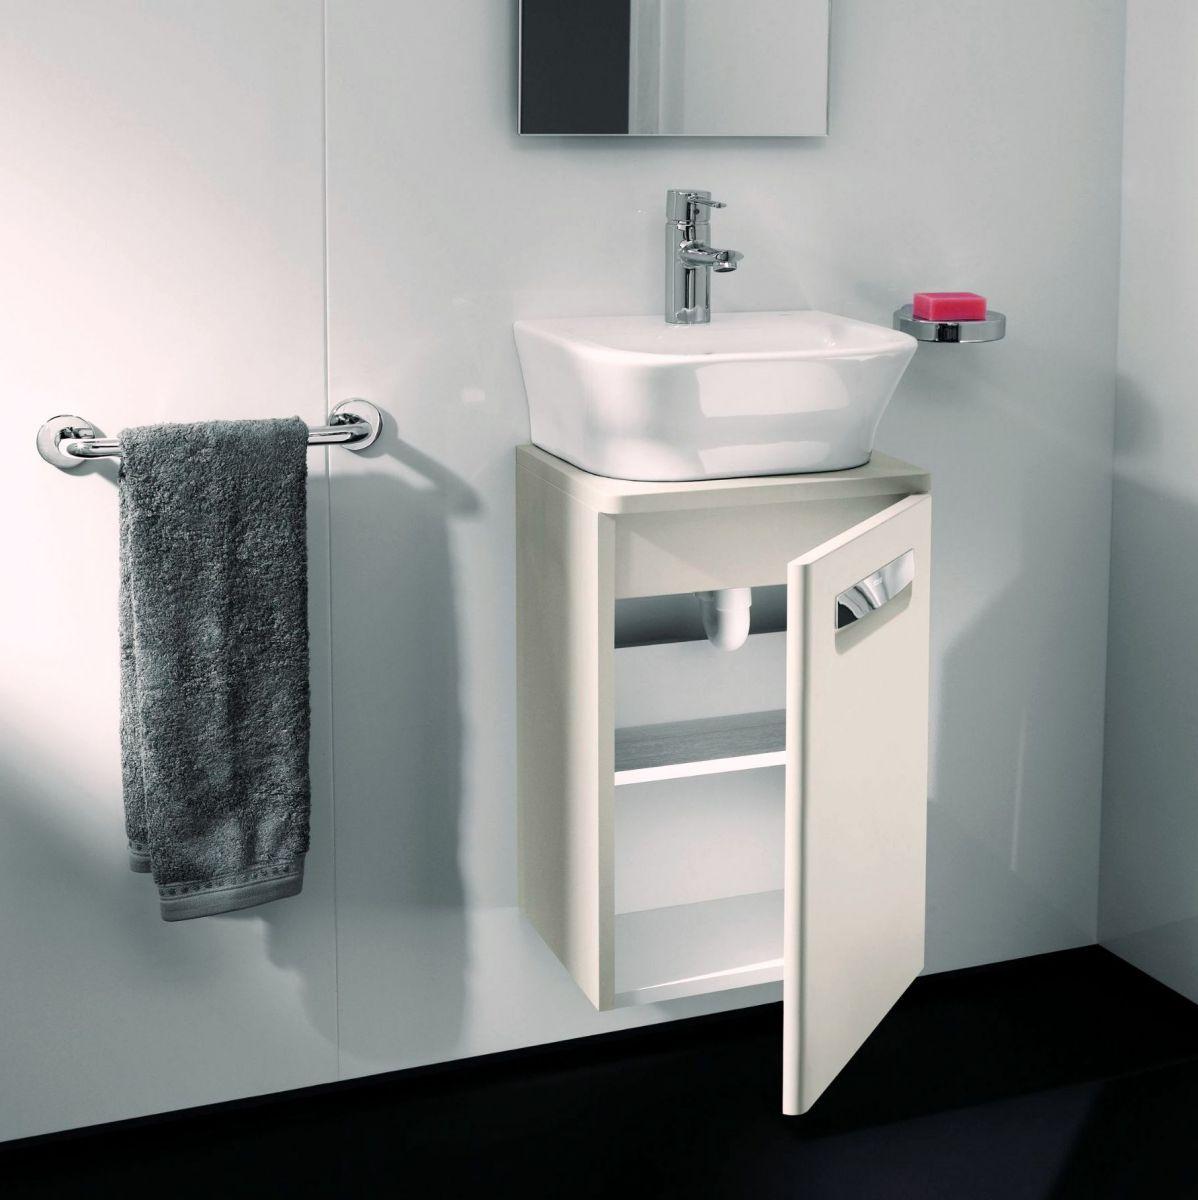 roca the gap n wall hung vanity unit with basin uk bathrooms. Black Bedroom Furniture Sets. Home Design Ideas